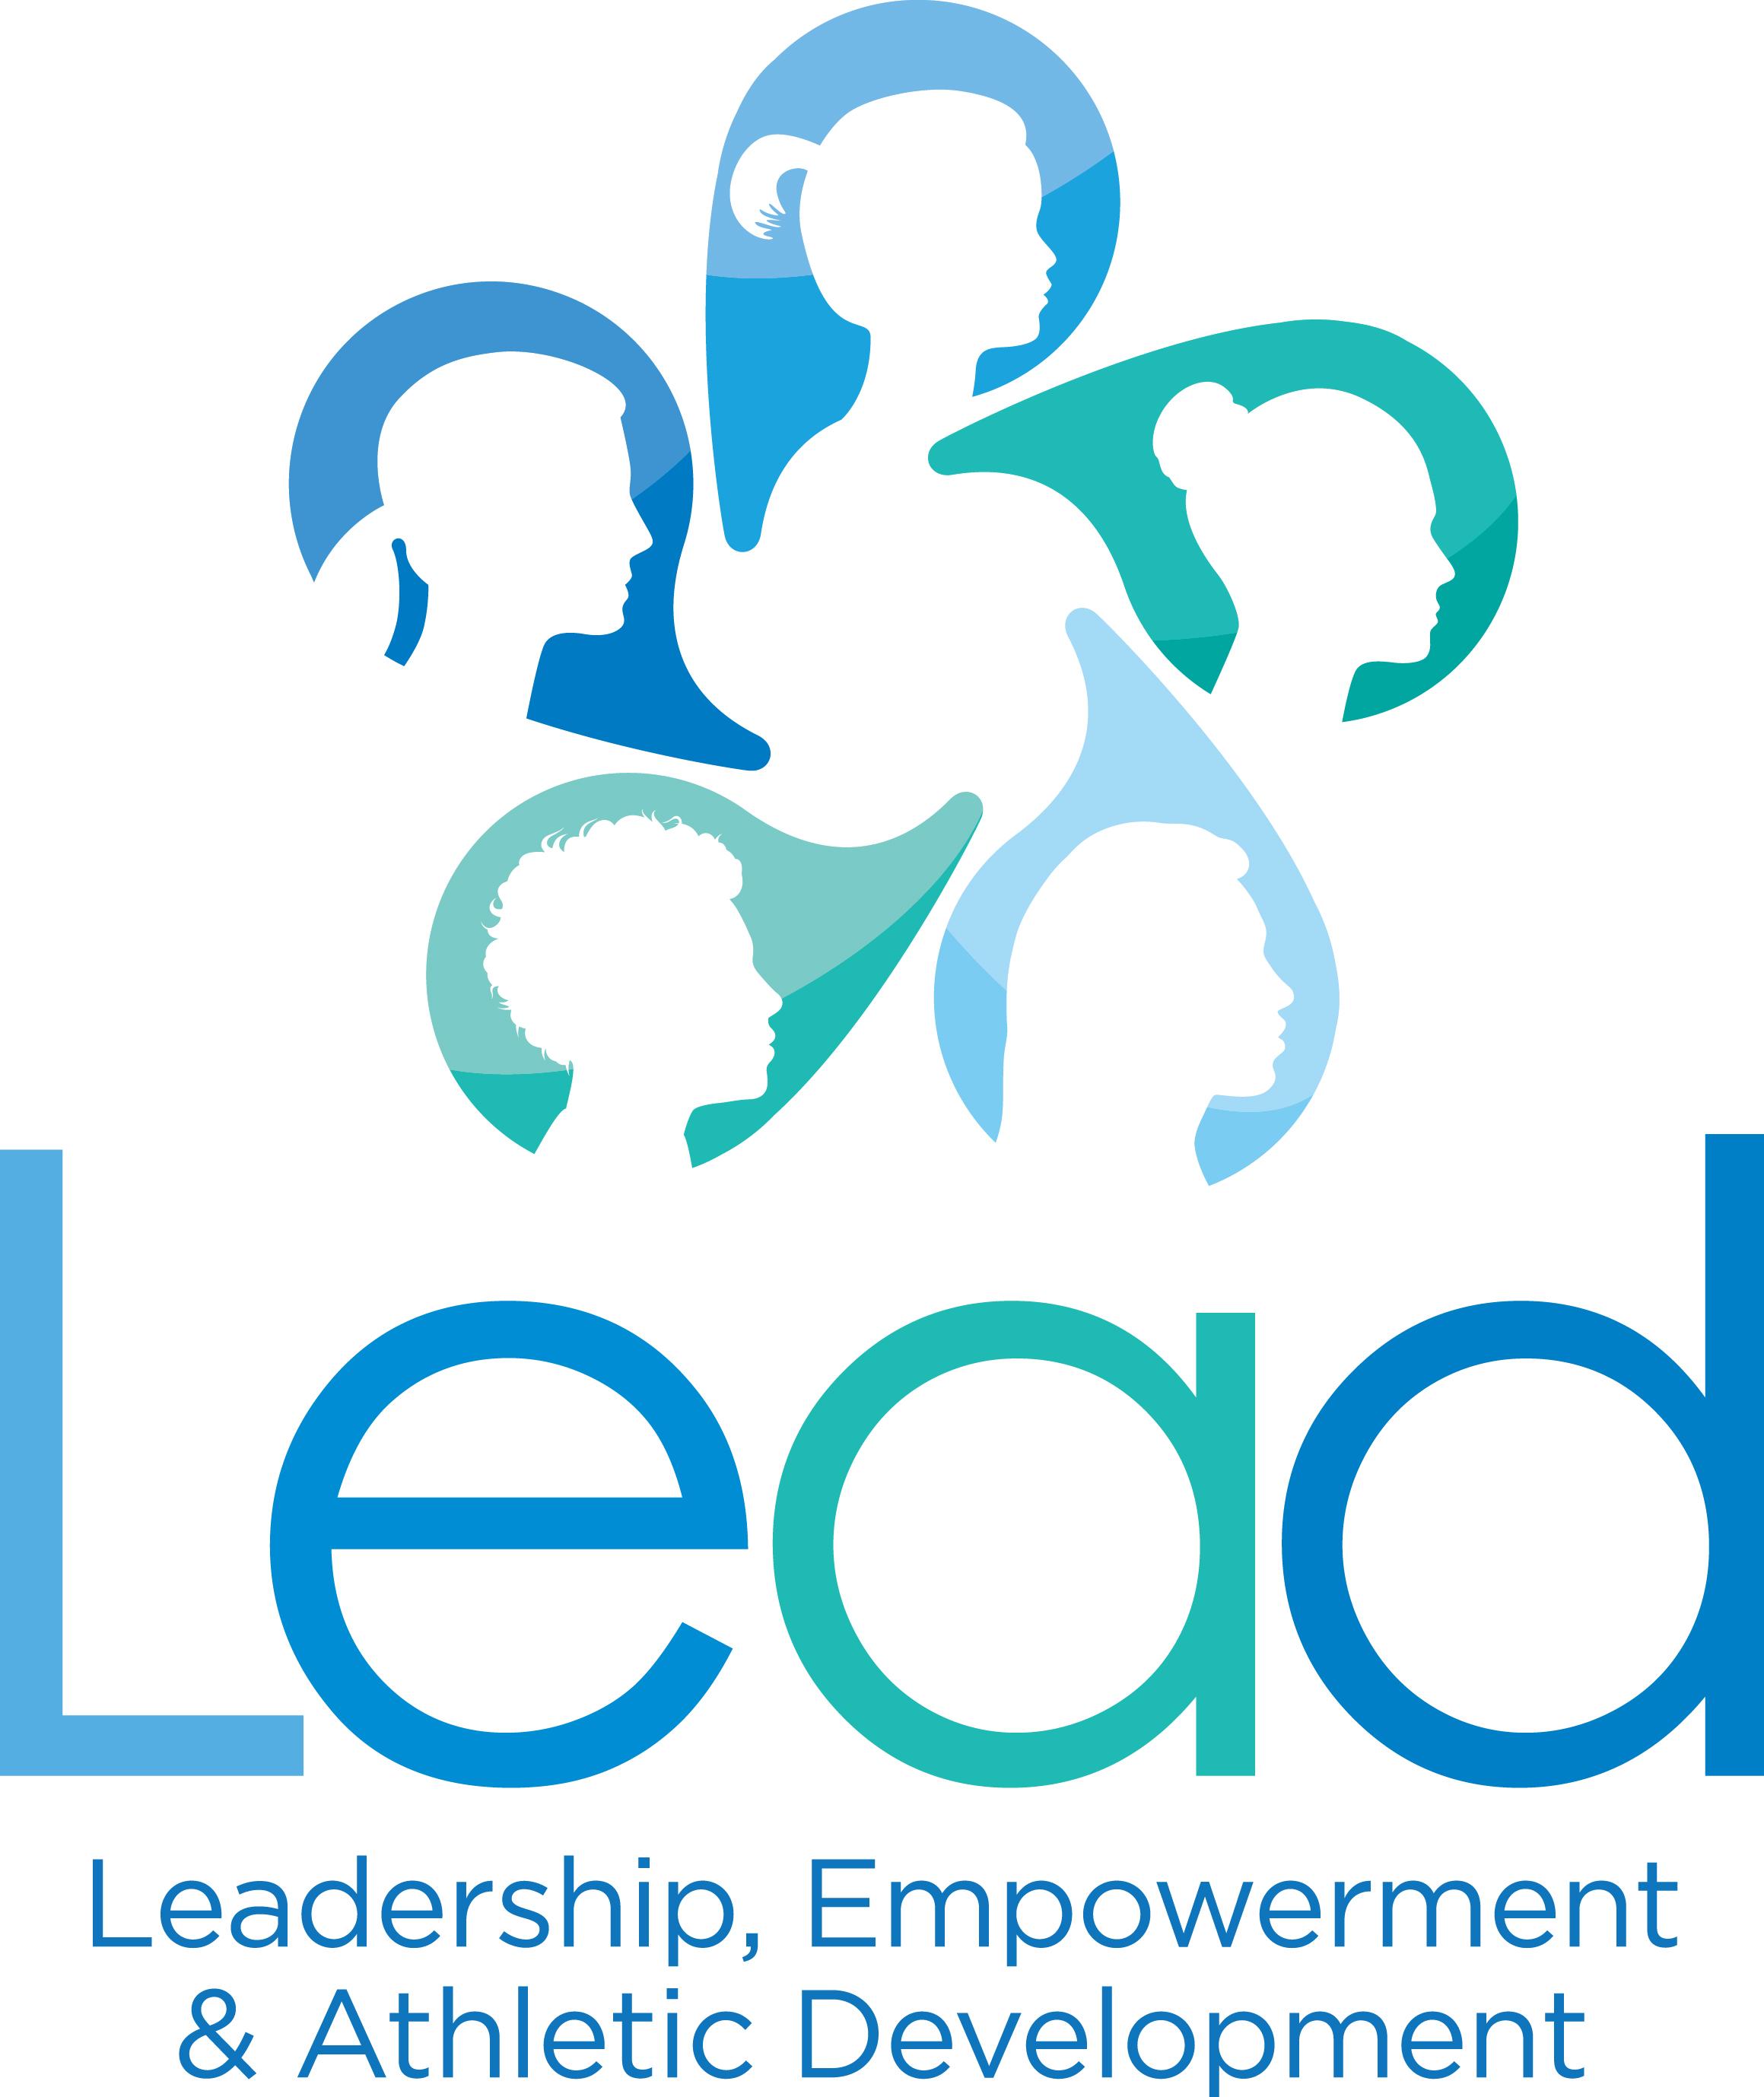 lead_logo design_final.jpg